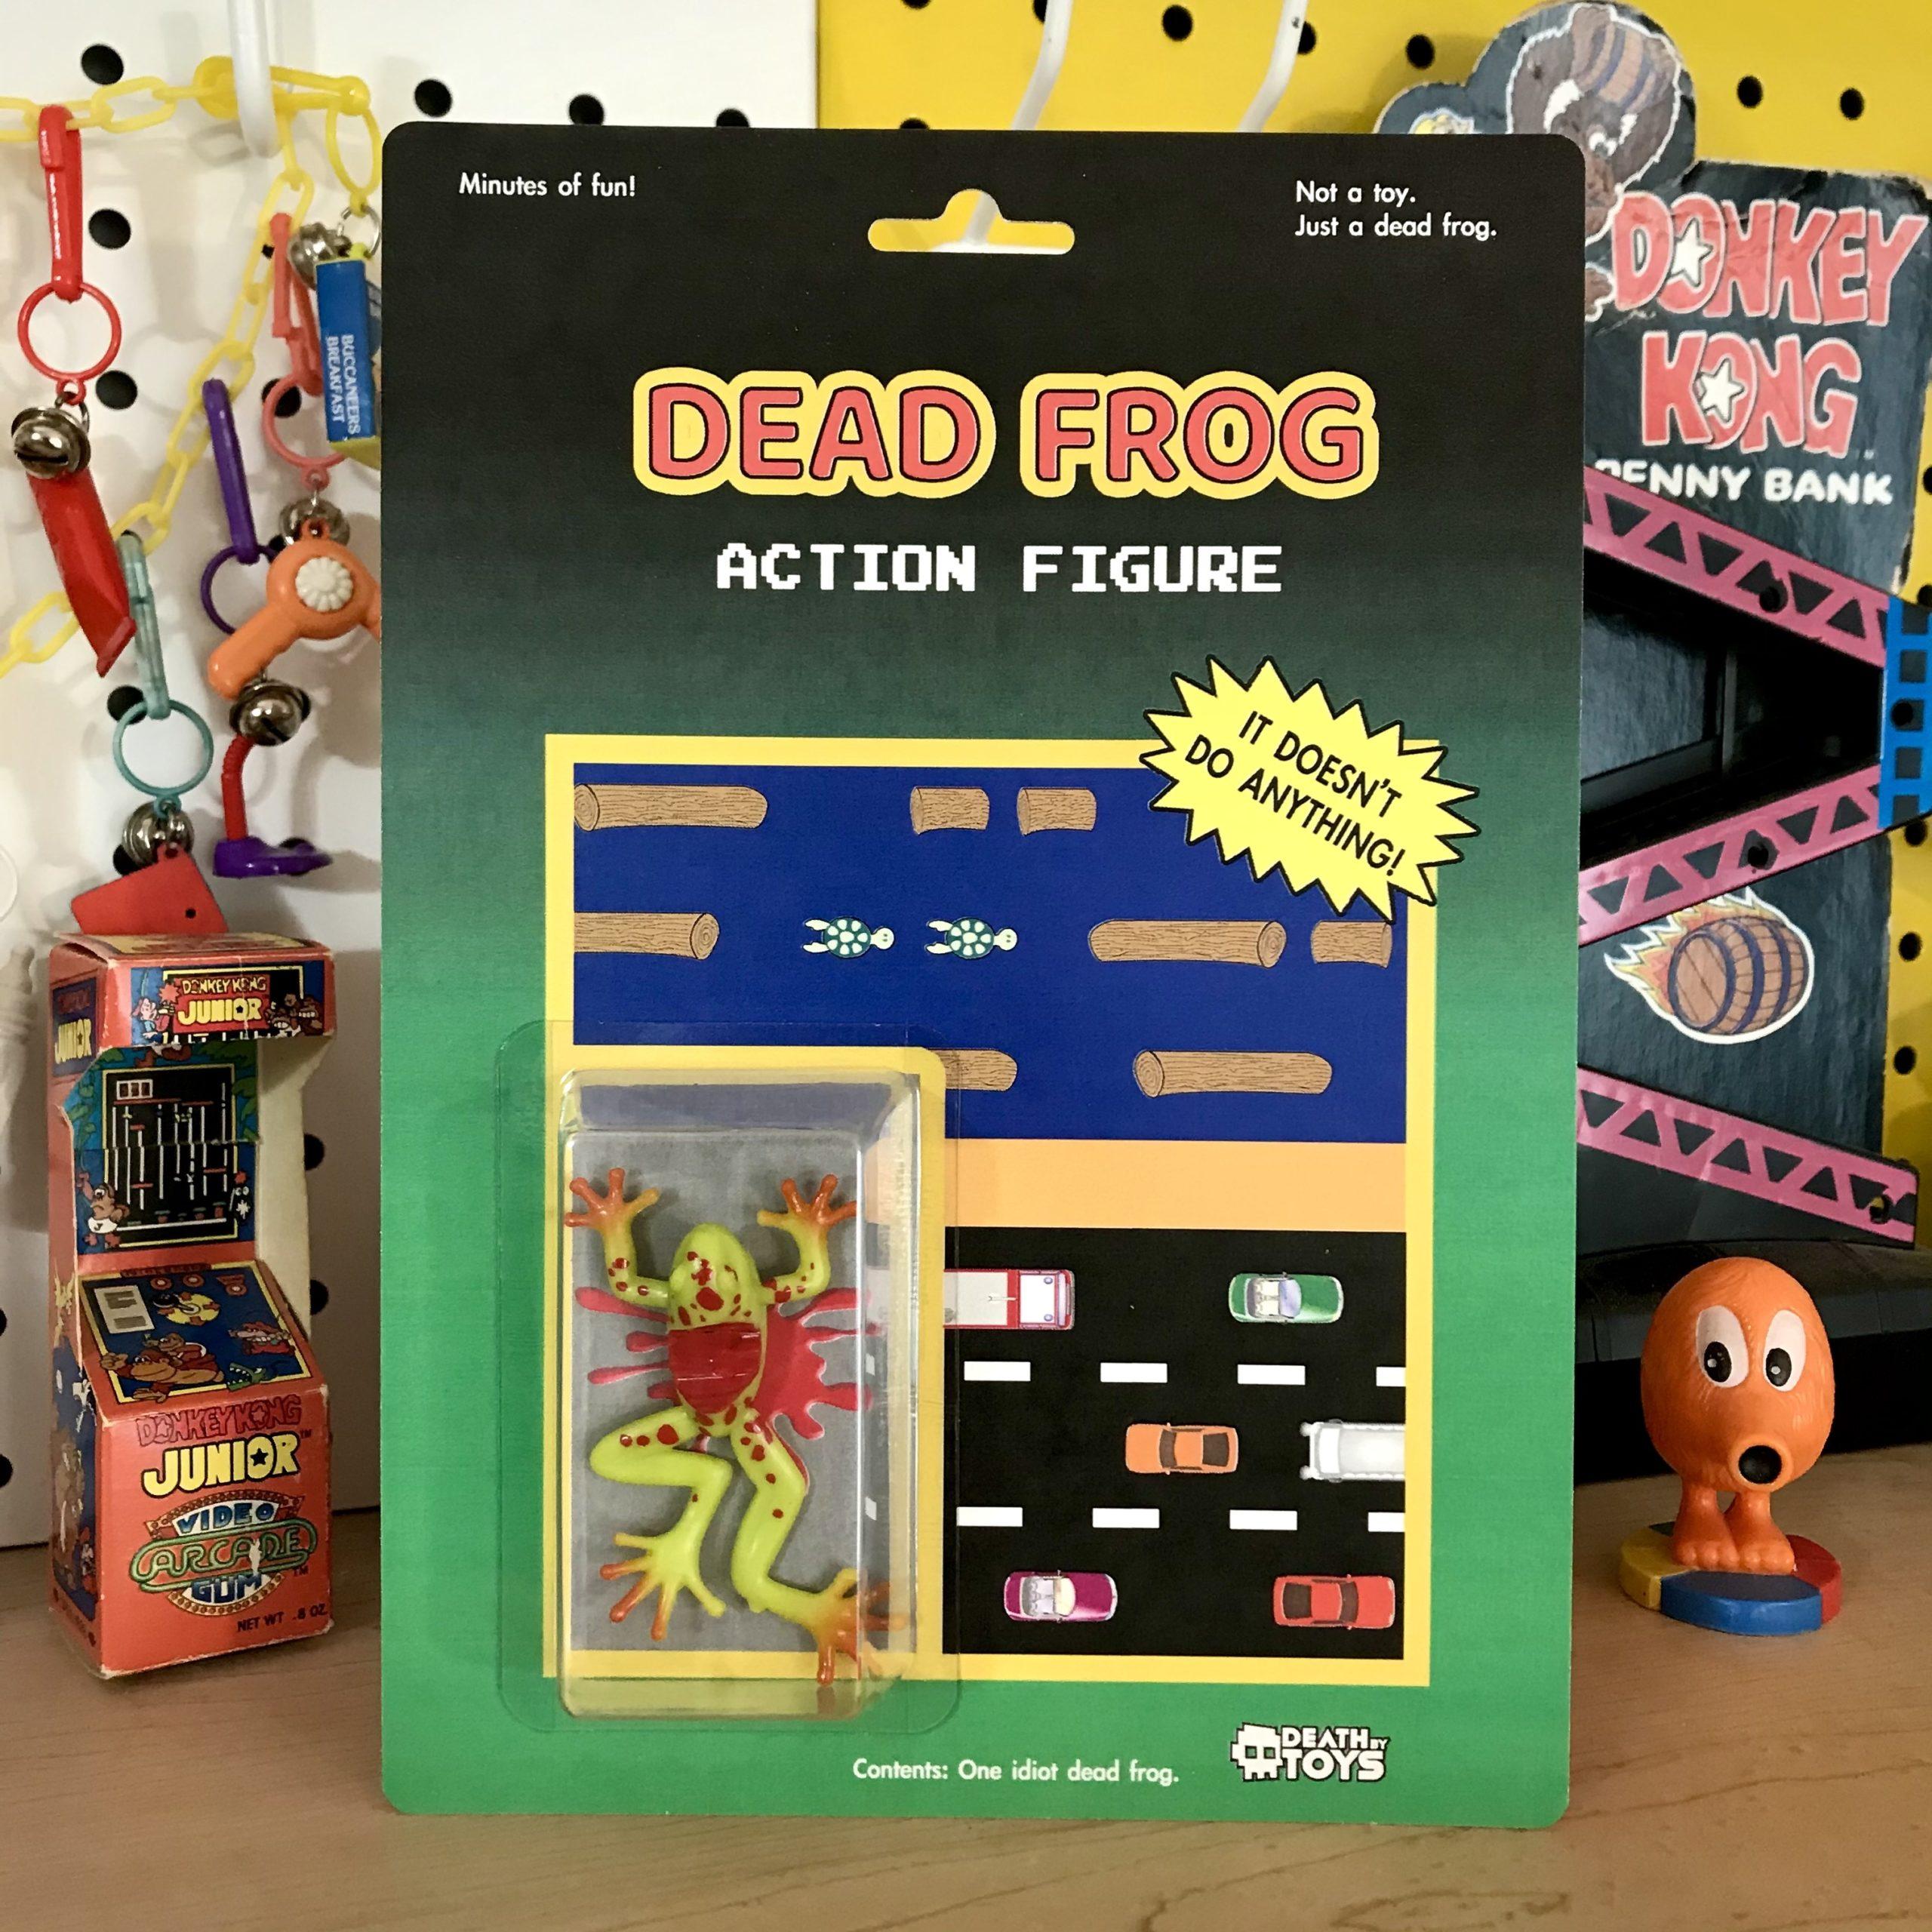 Dead Frog Action Figure